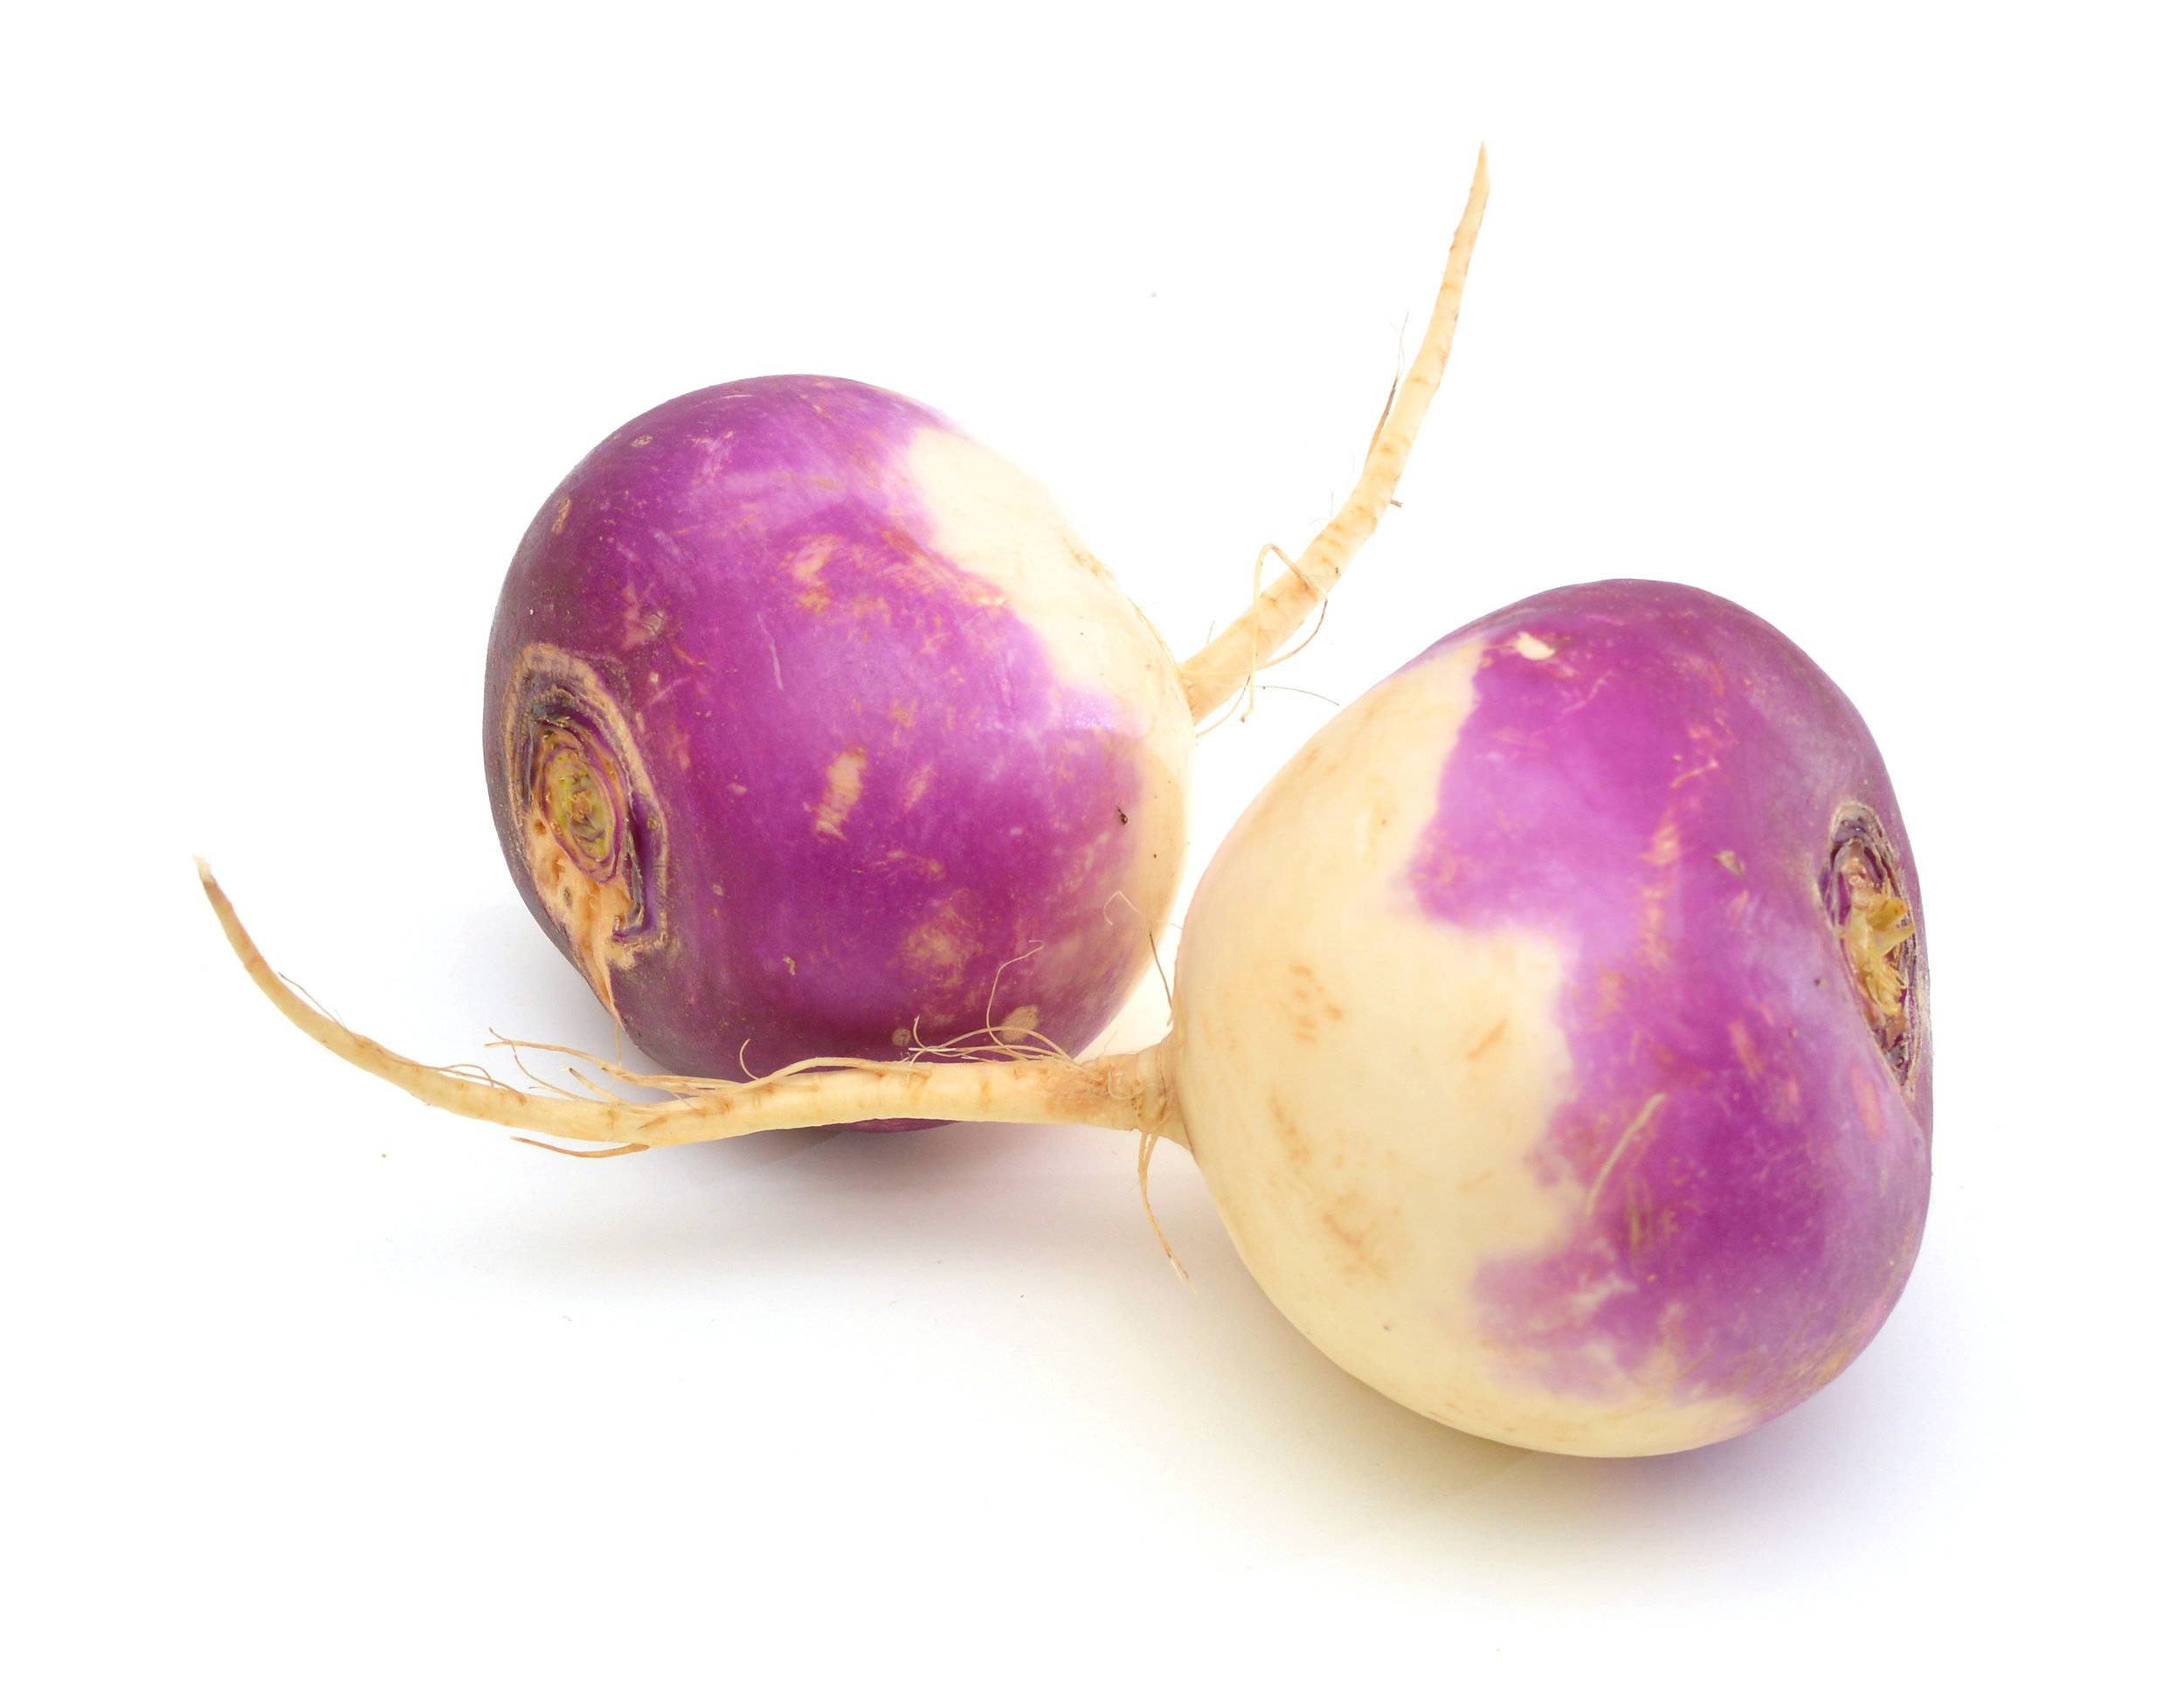 purple-top-turnips.jpg